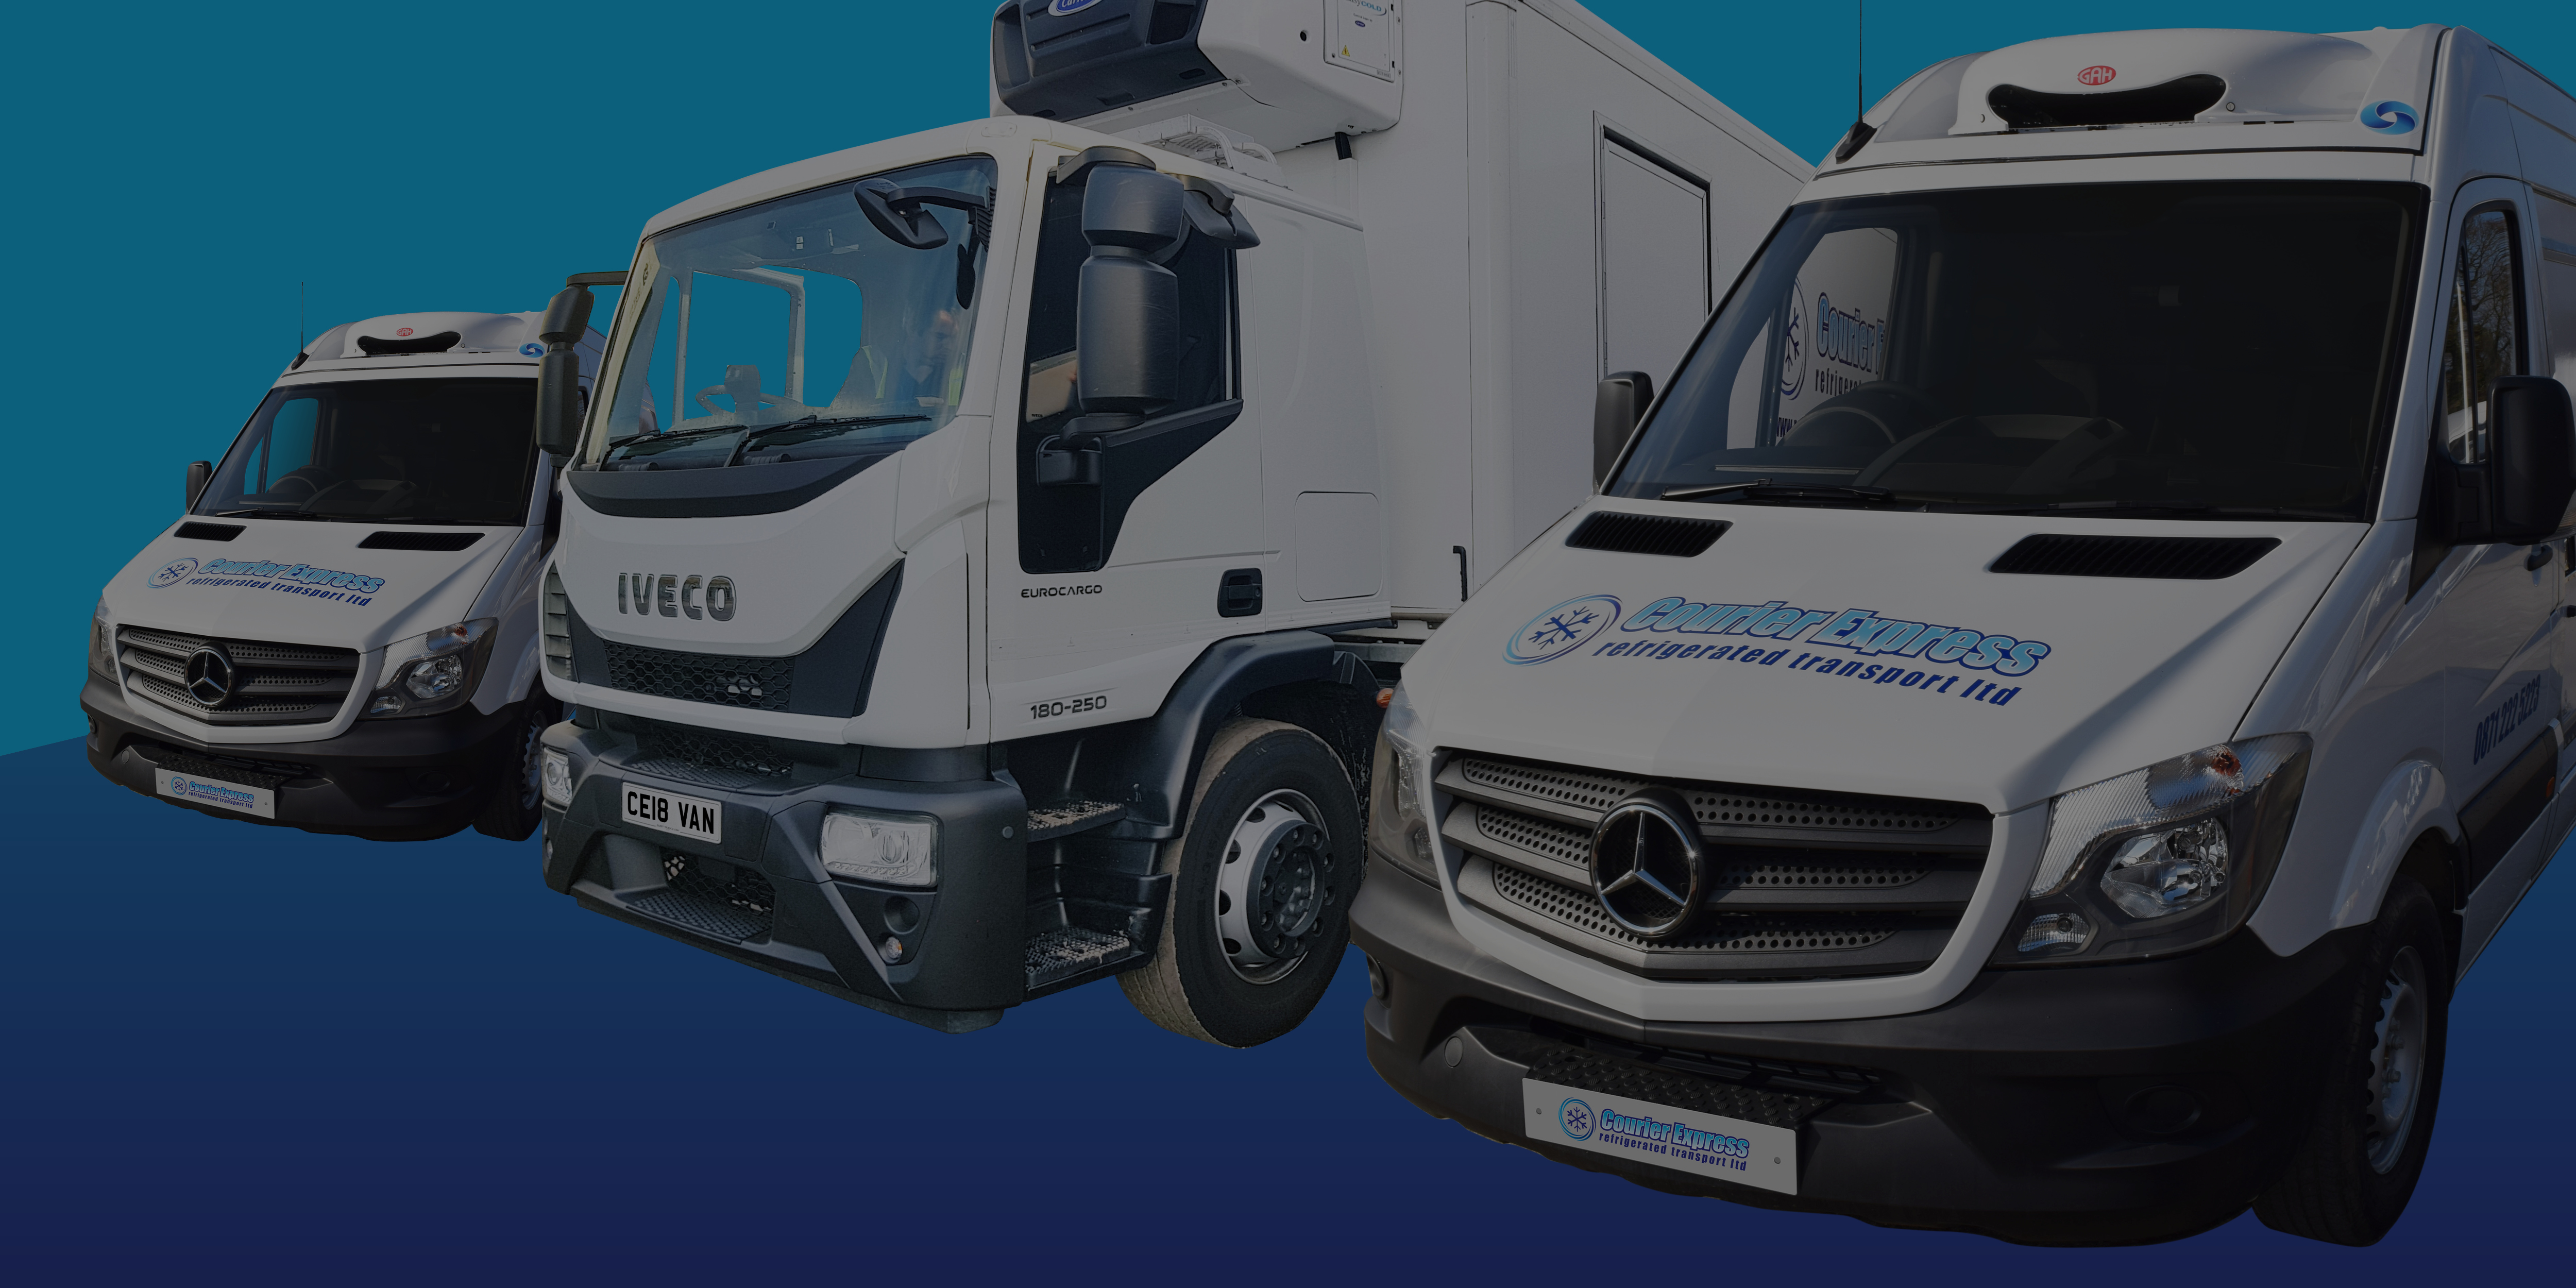 courier express | fleet of vehicles - multi-drop food service